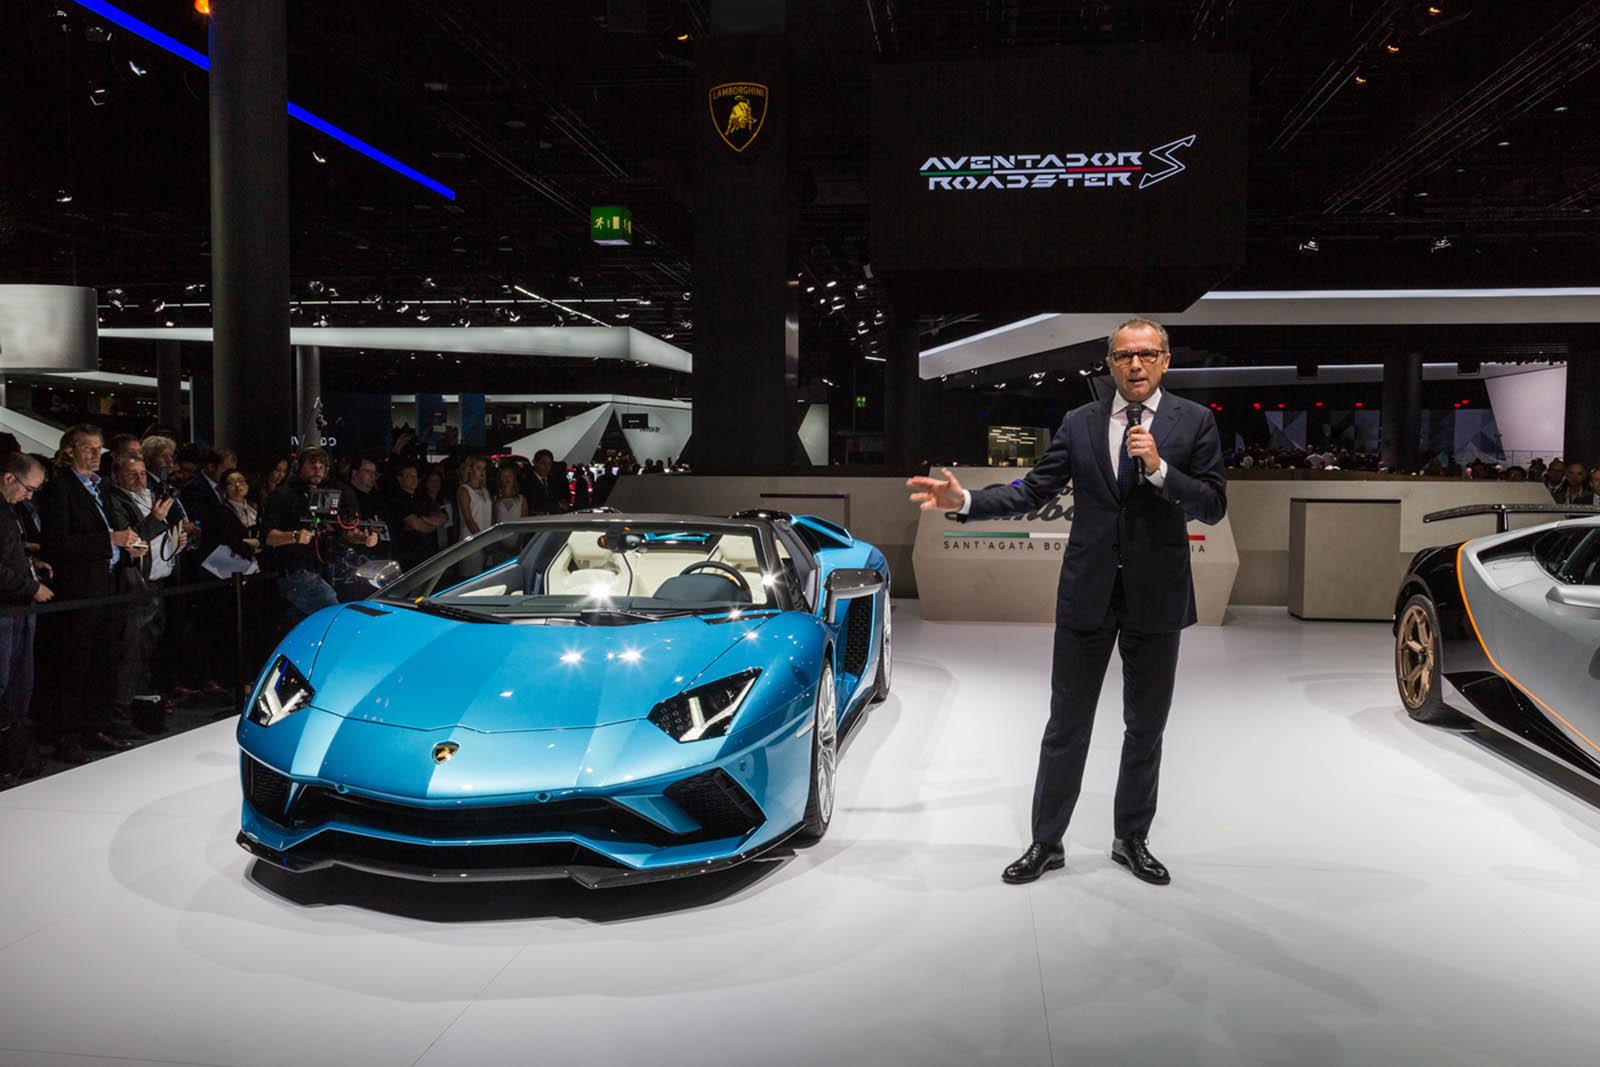 Lamborghini Aventador Roadster S facelift (5)